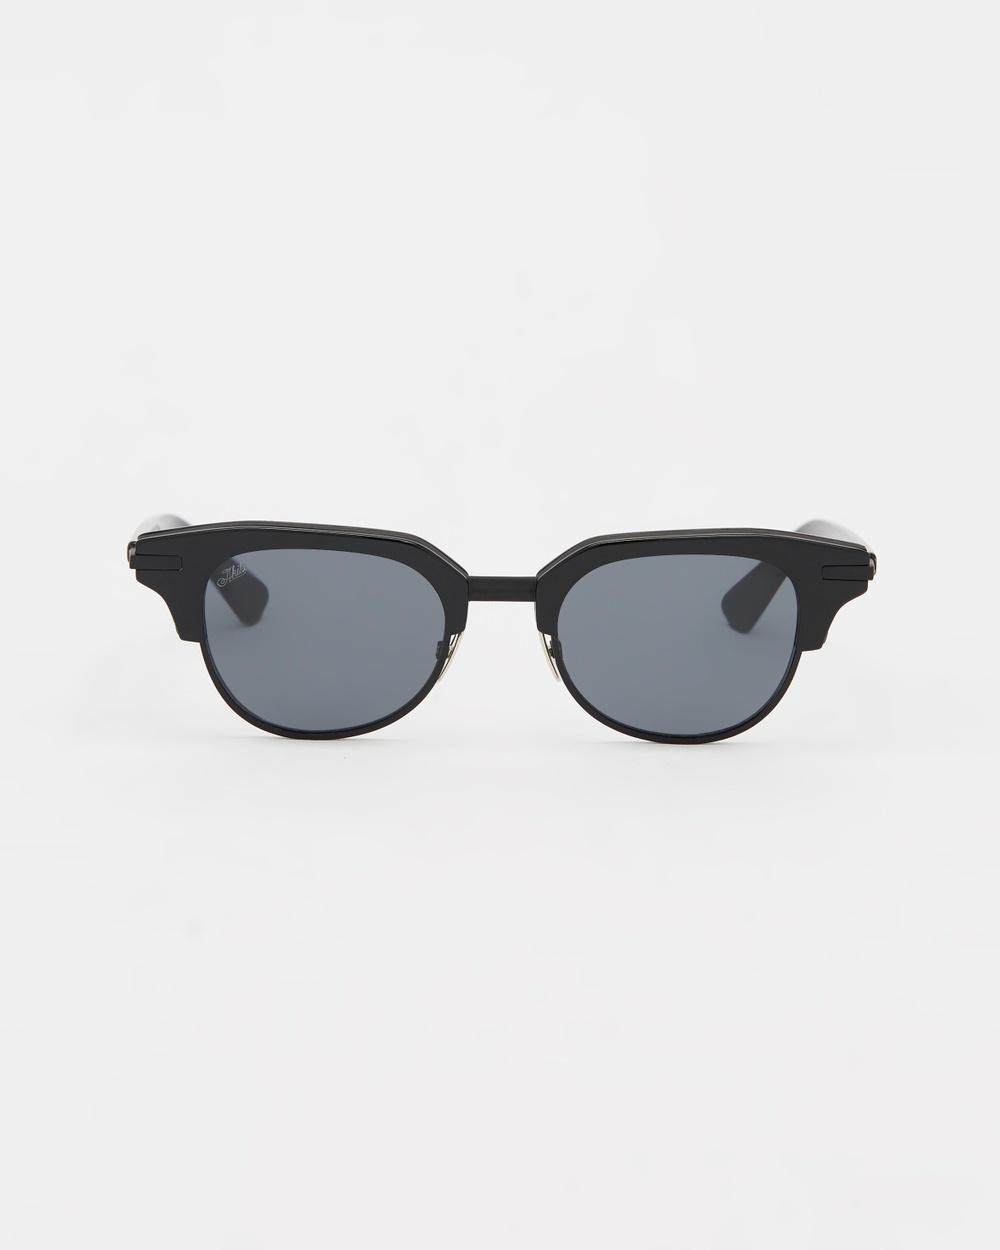 AKILA M.Y.C Sunglasses Black